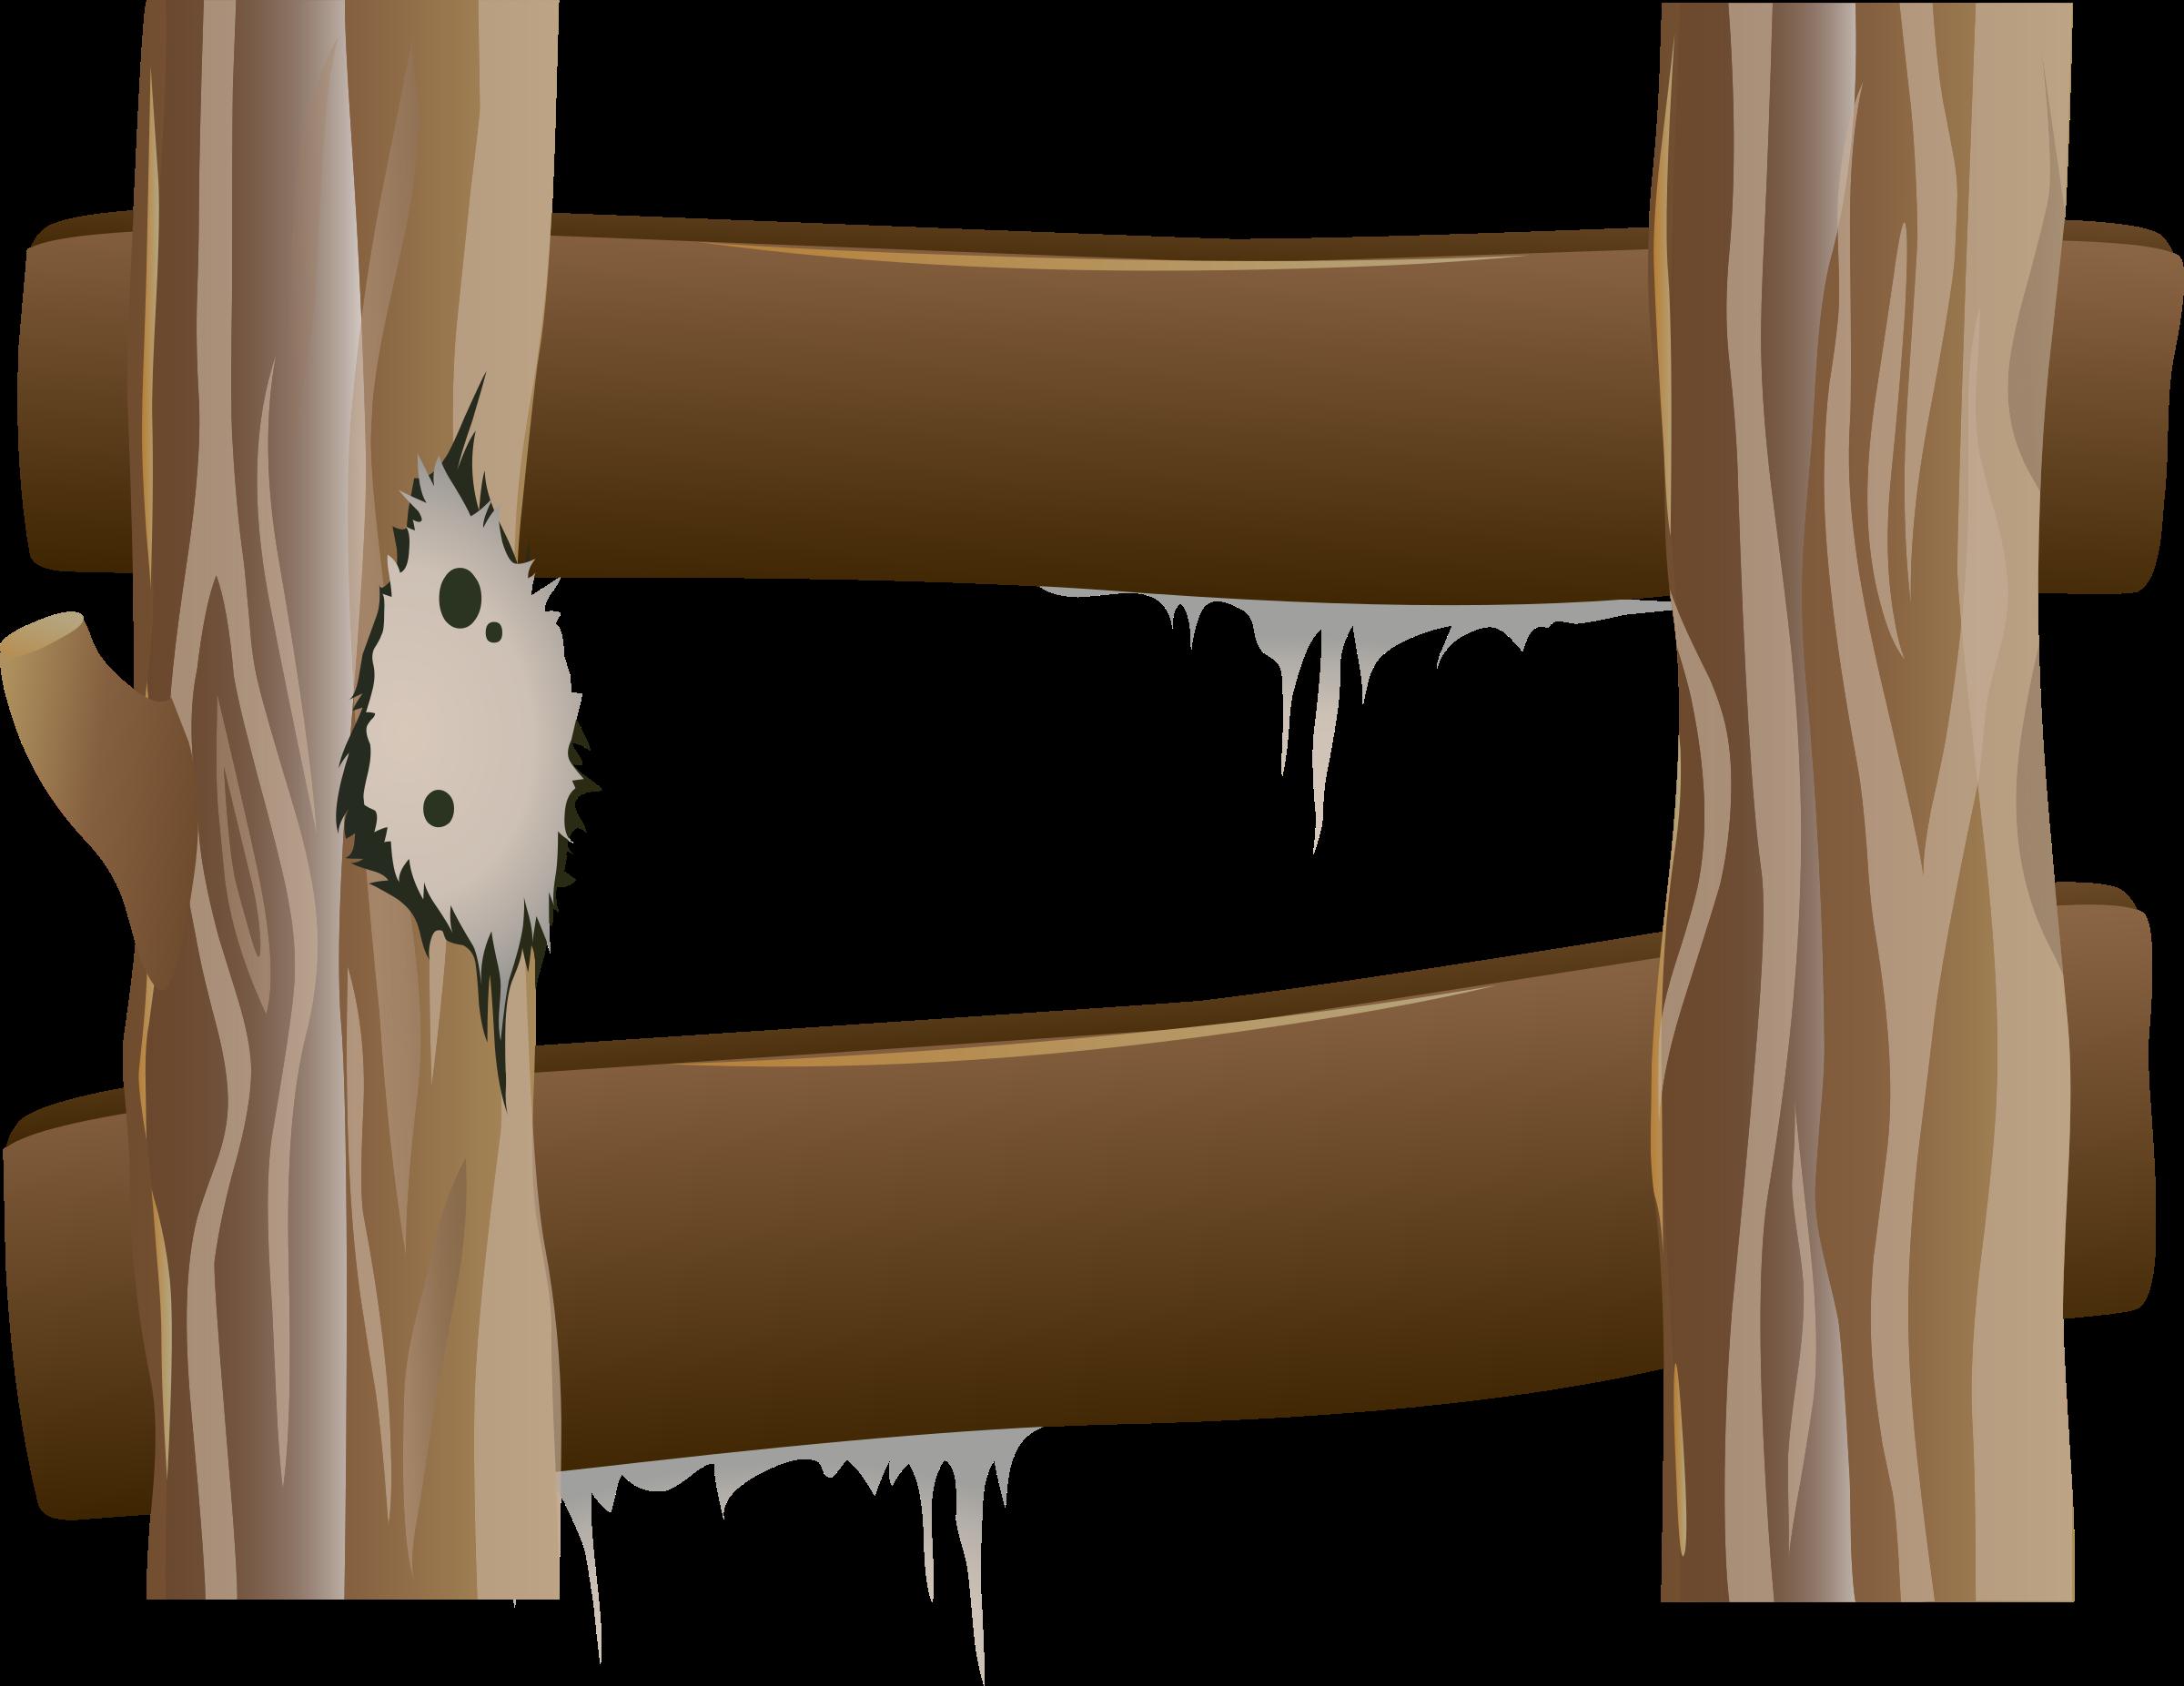 Ladder clipart purple. Ilmenskie tree int icons